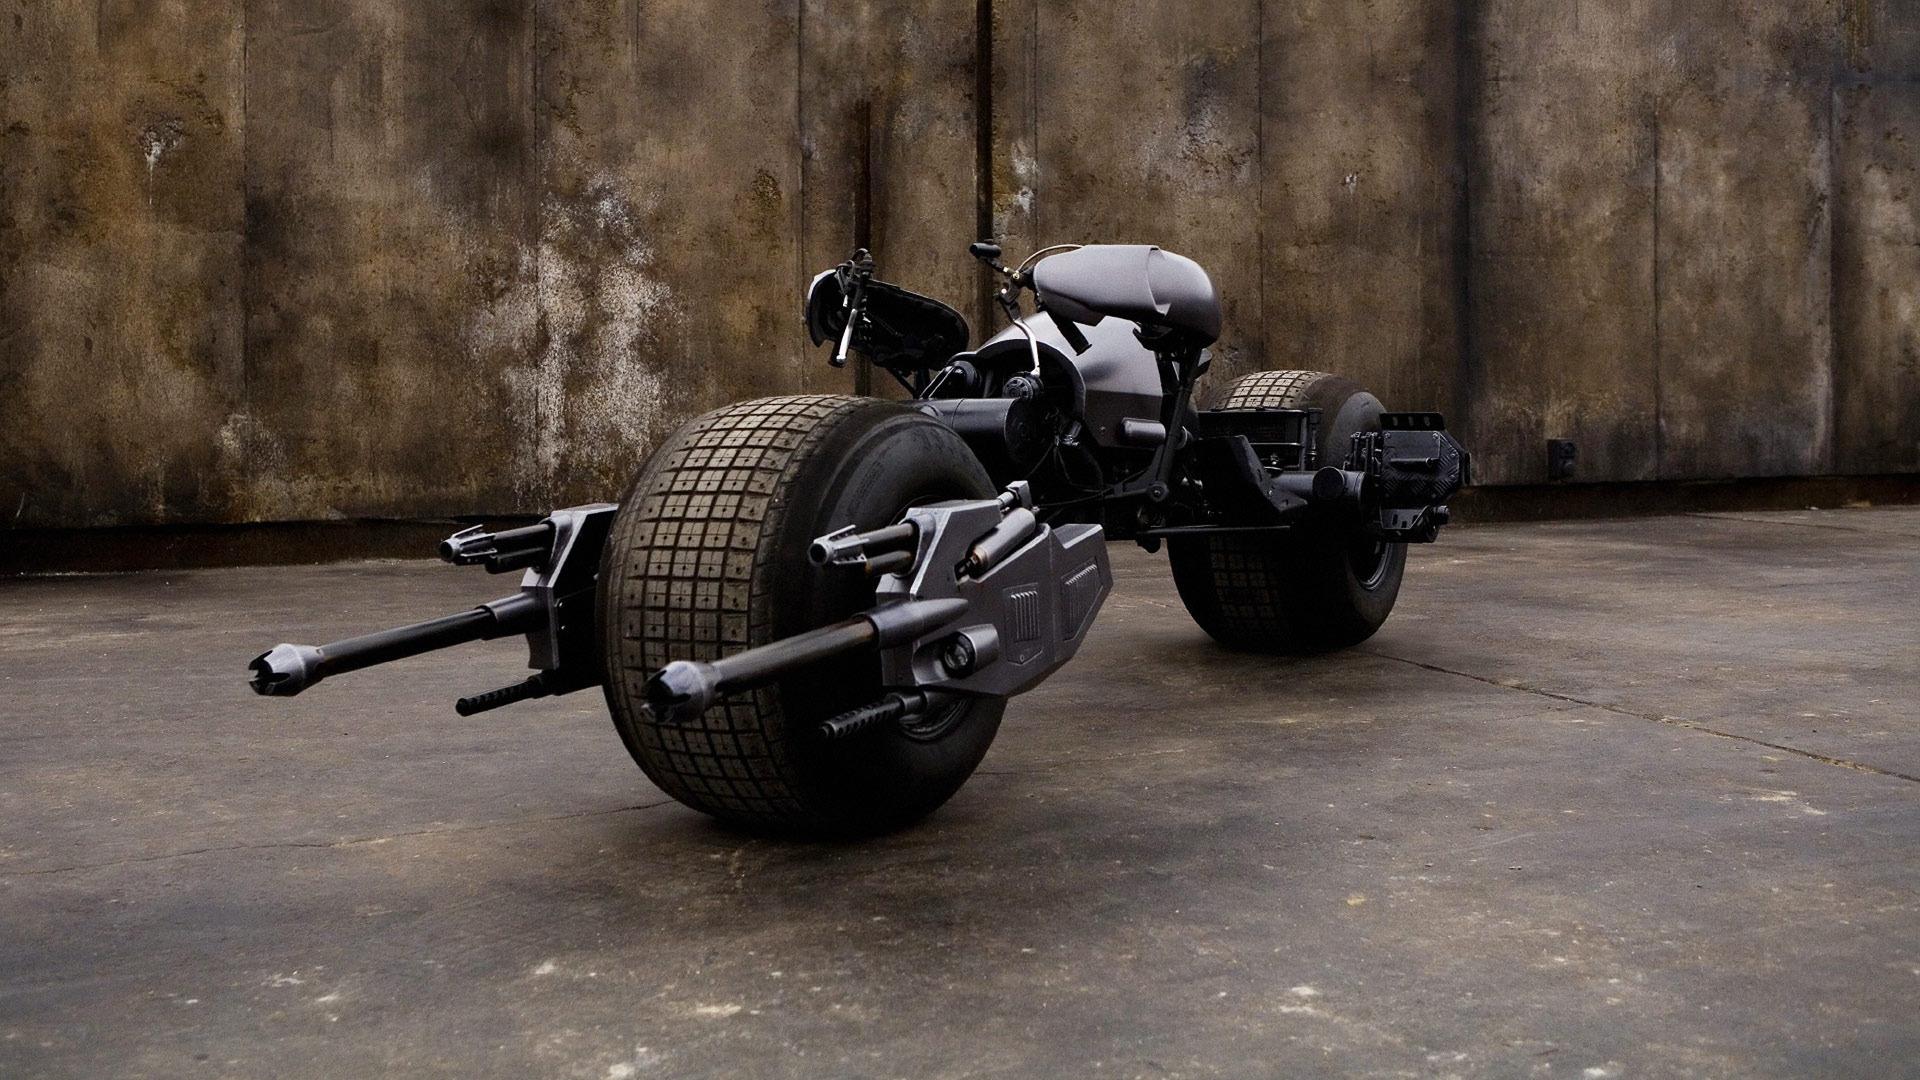 batman bike wallpaper